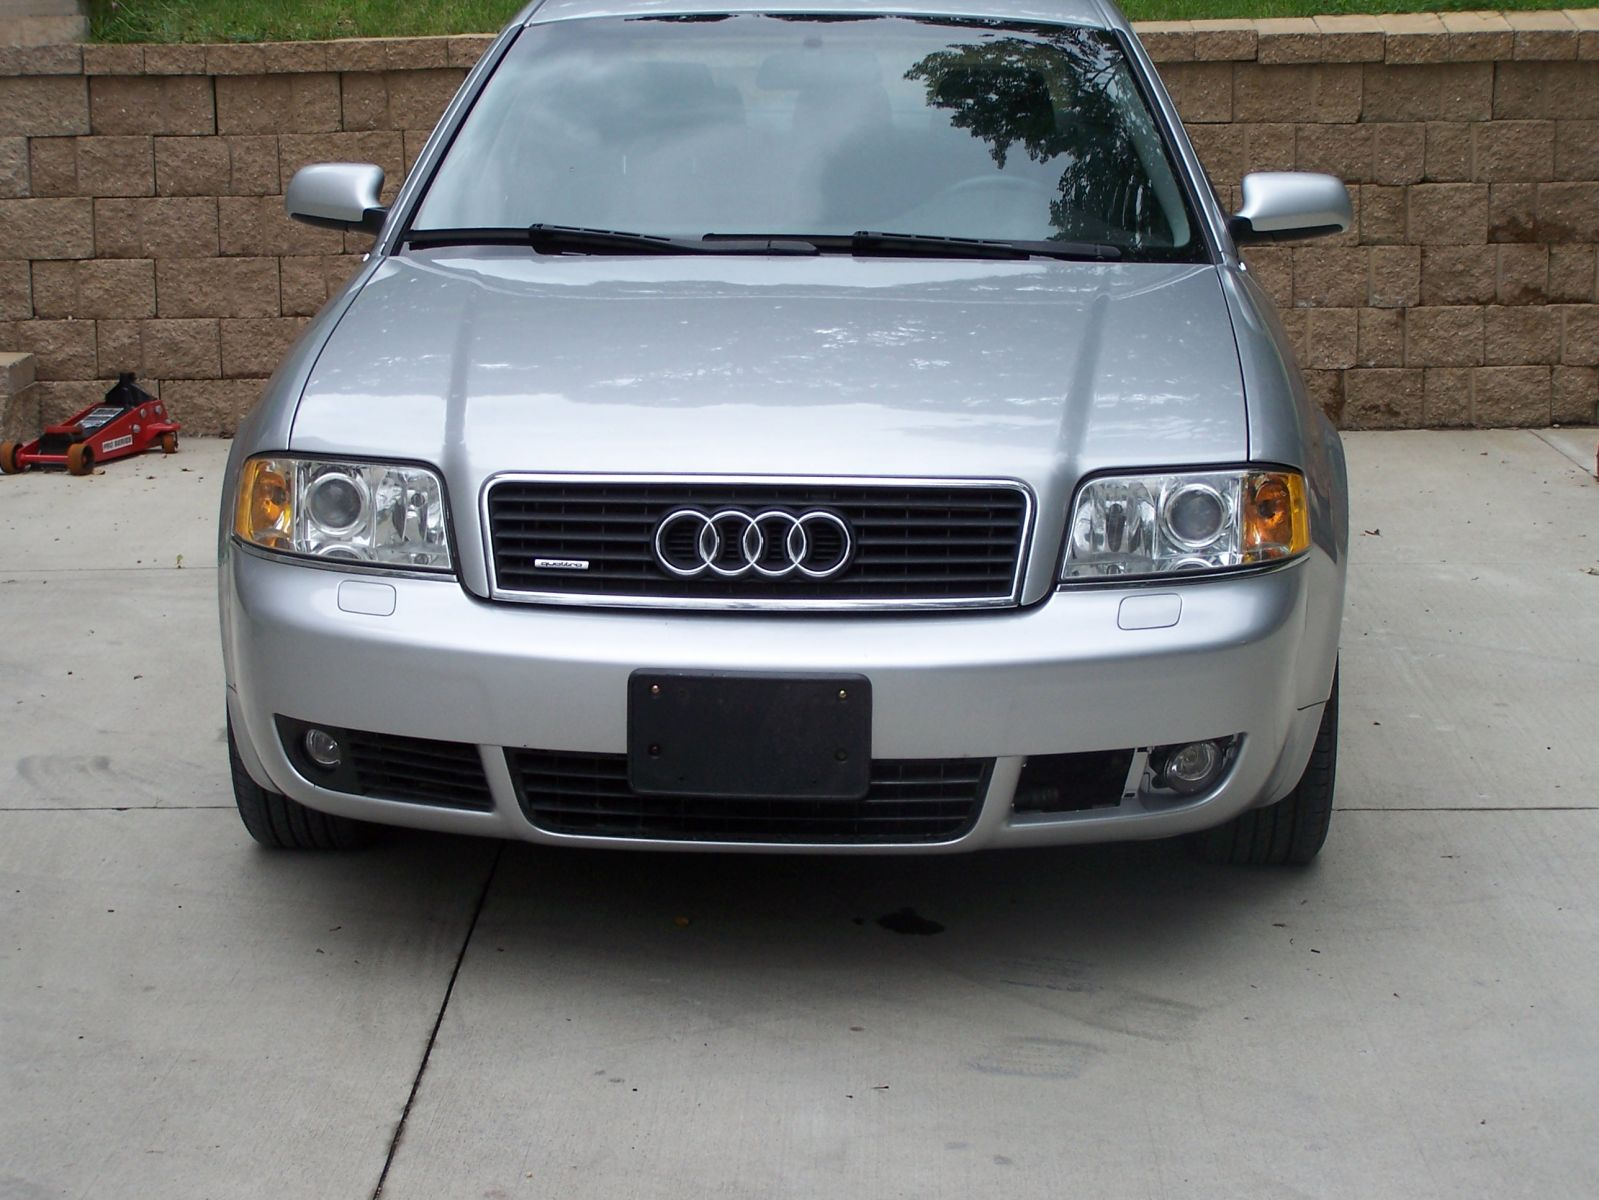 2002 Audi a6, finally fixed.. PICS!